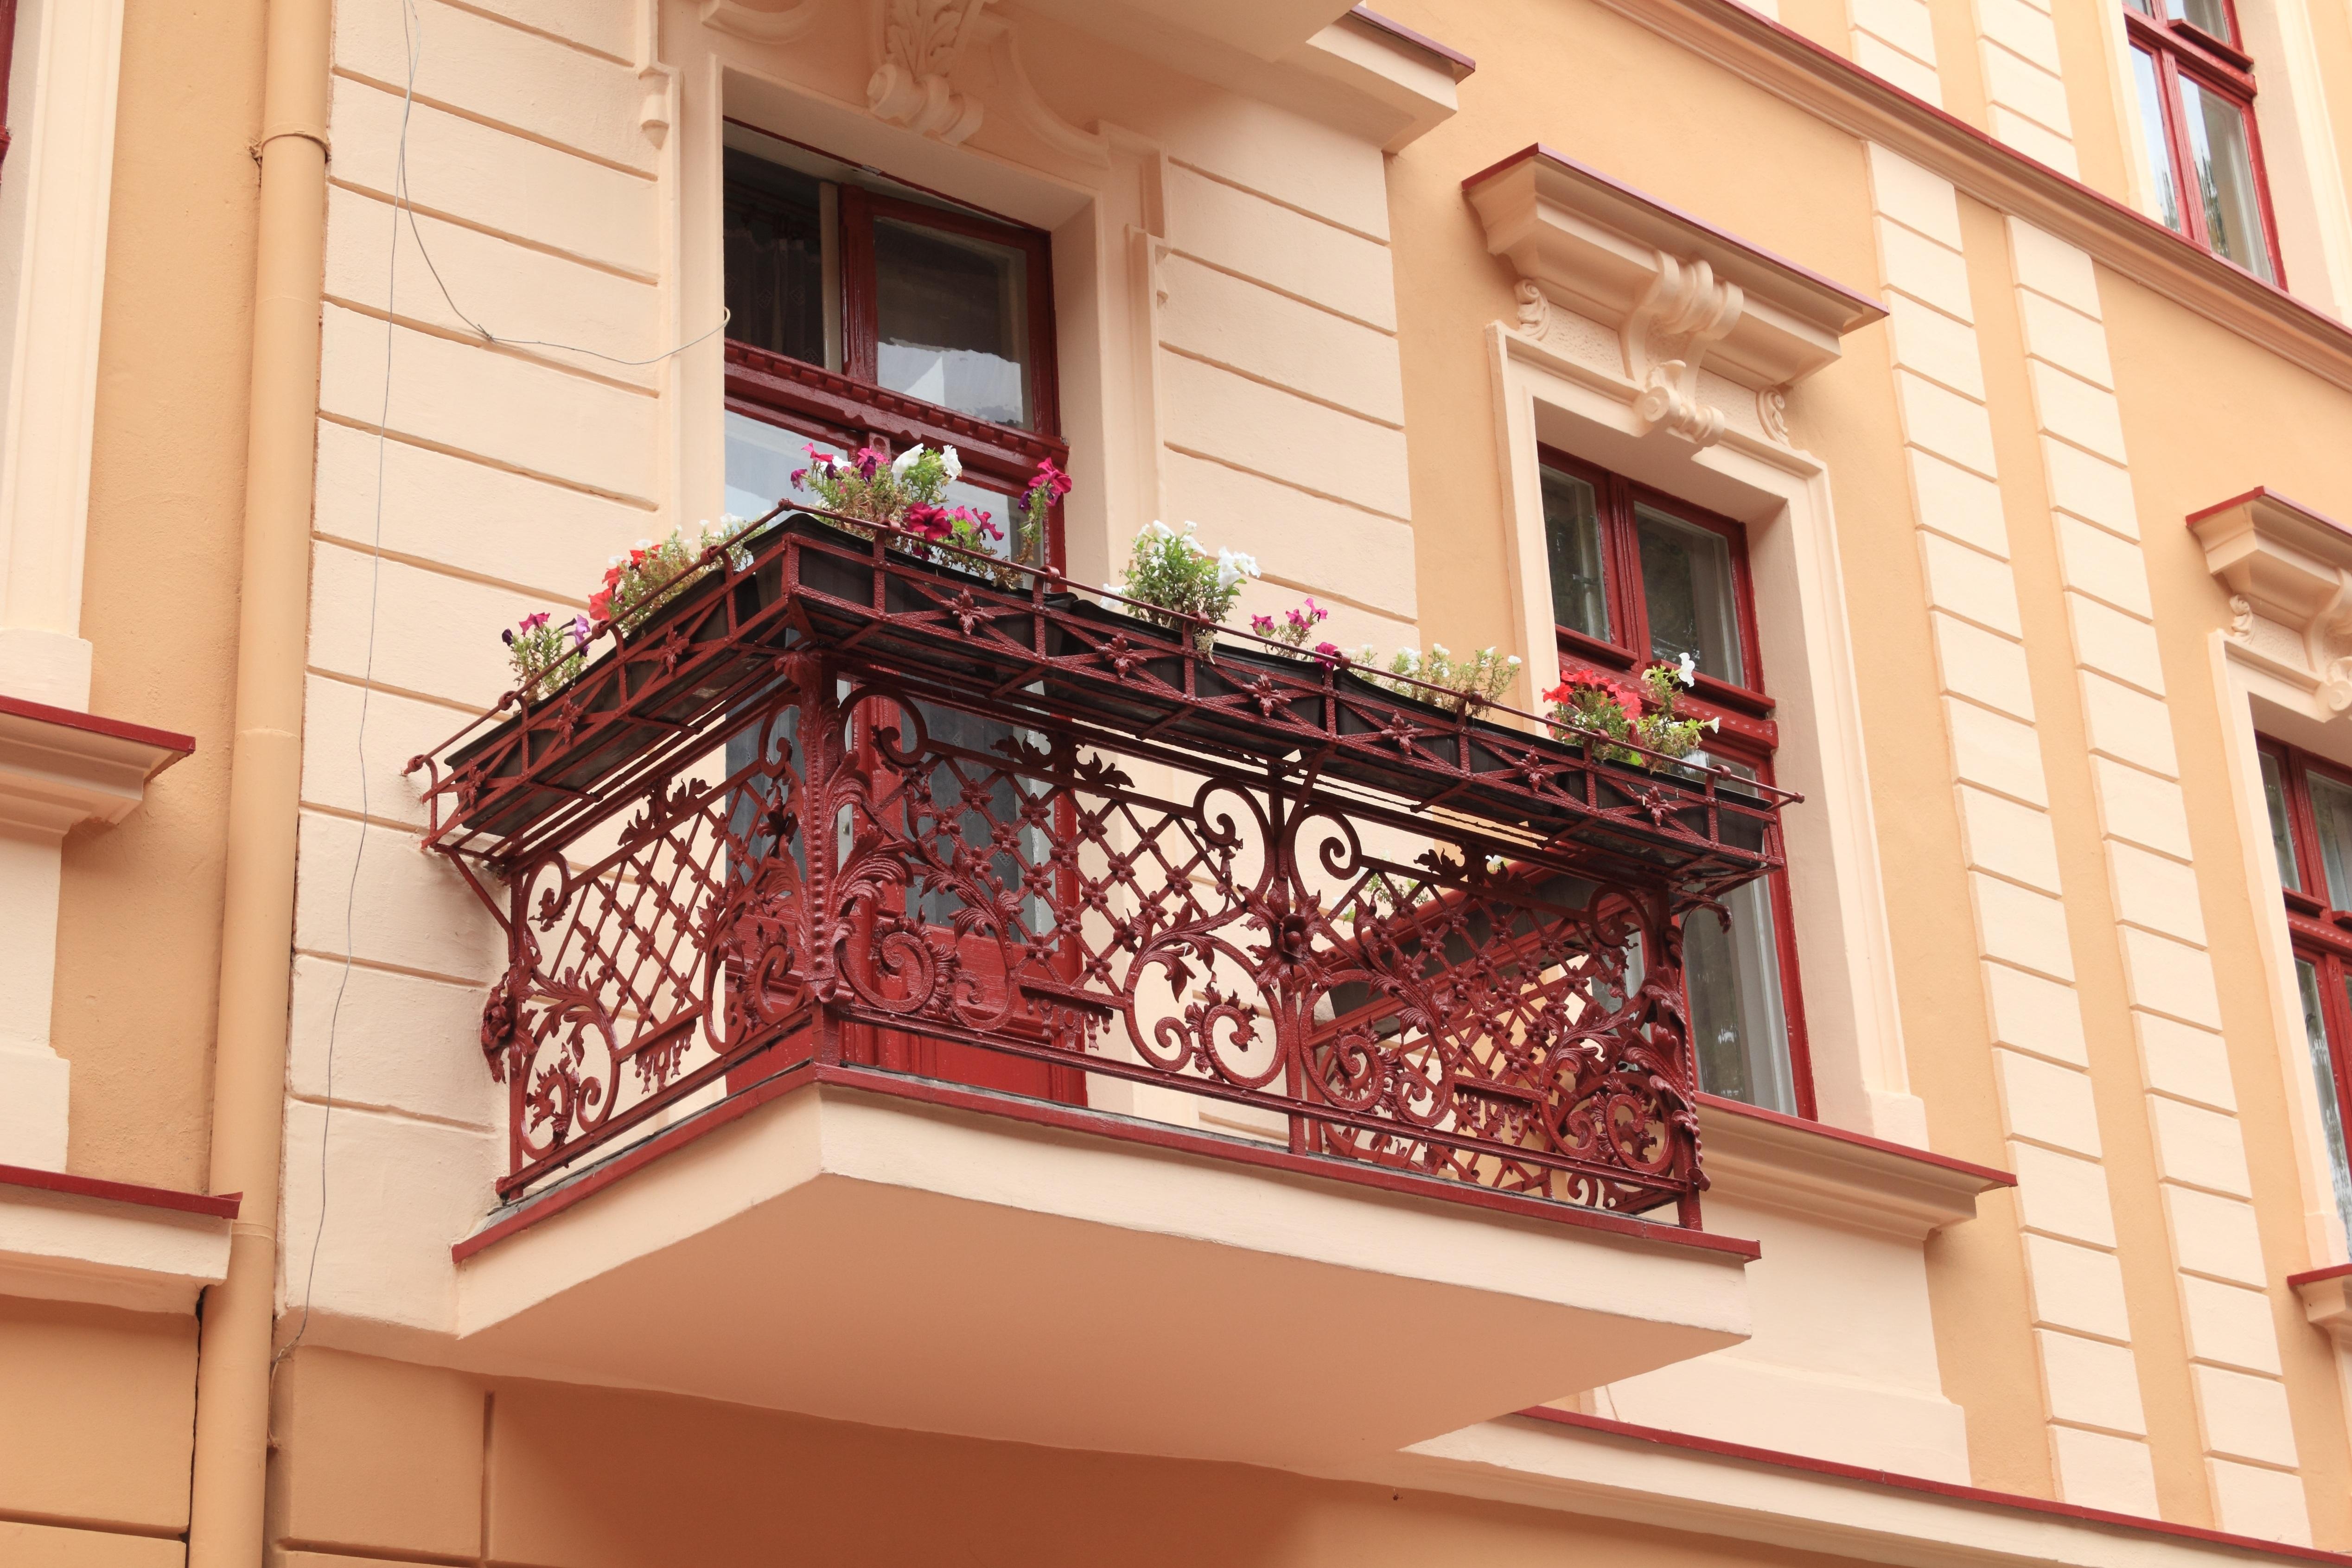 Fotos gratis arquitectura madera casa ventana porche for Escalera de madera al aire libre precio